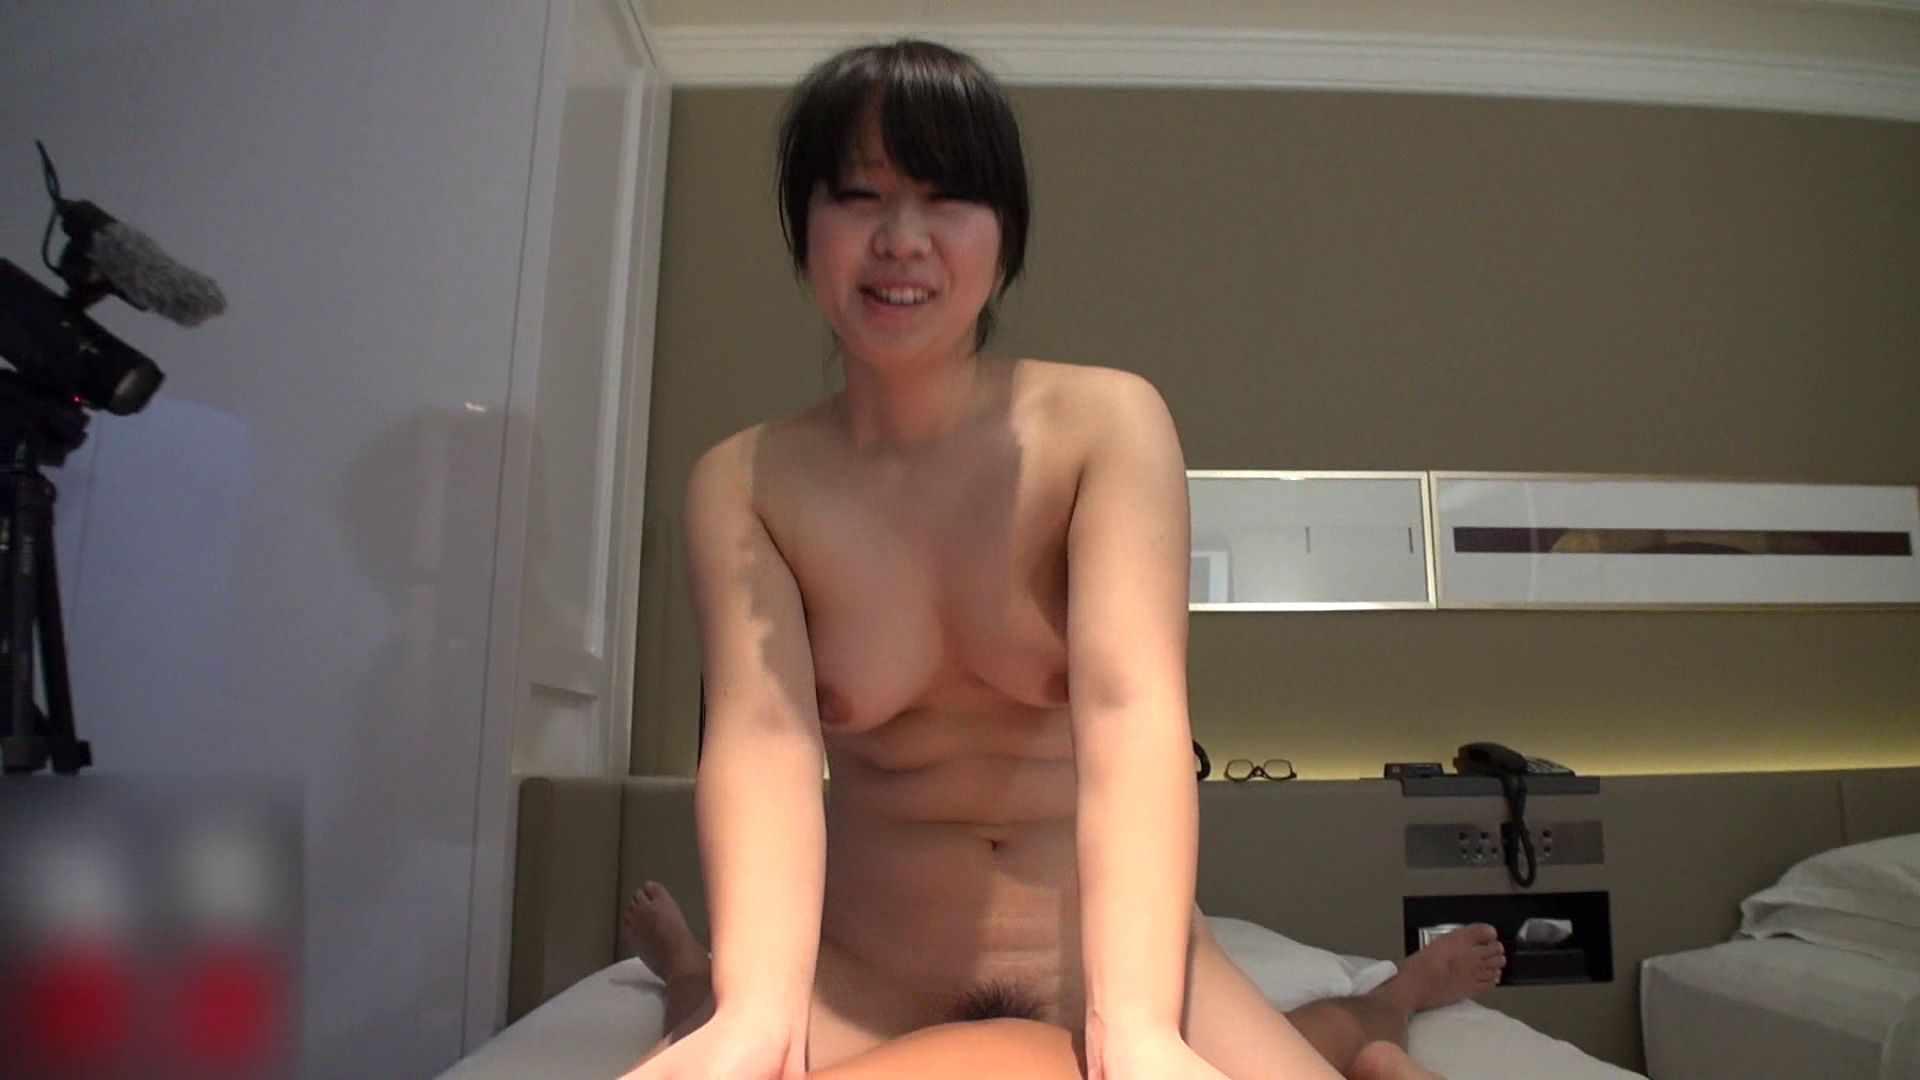 S級厳選美女ビッチガールVol.39 後編 美しいOLの裸体 隠し撮りオマンコ動画紹介 72pic 56